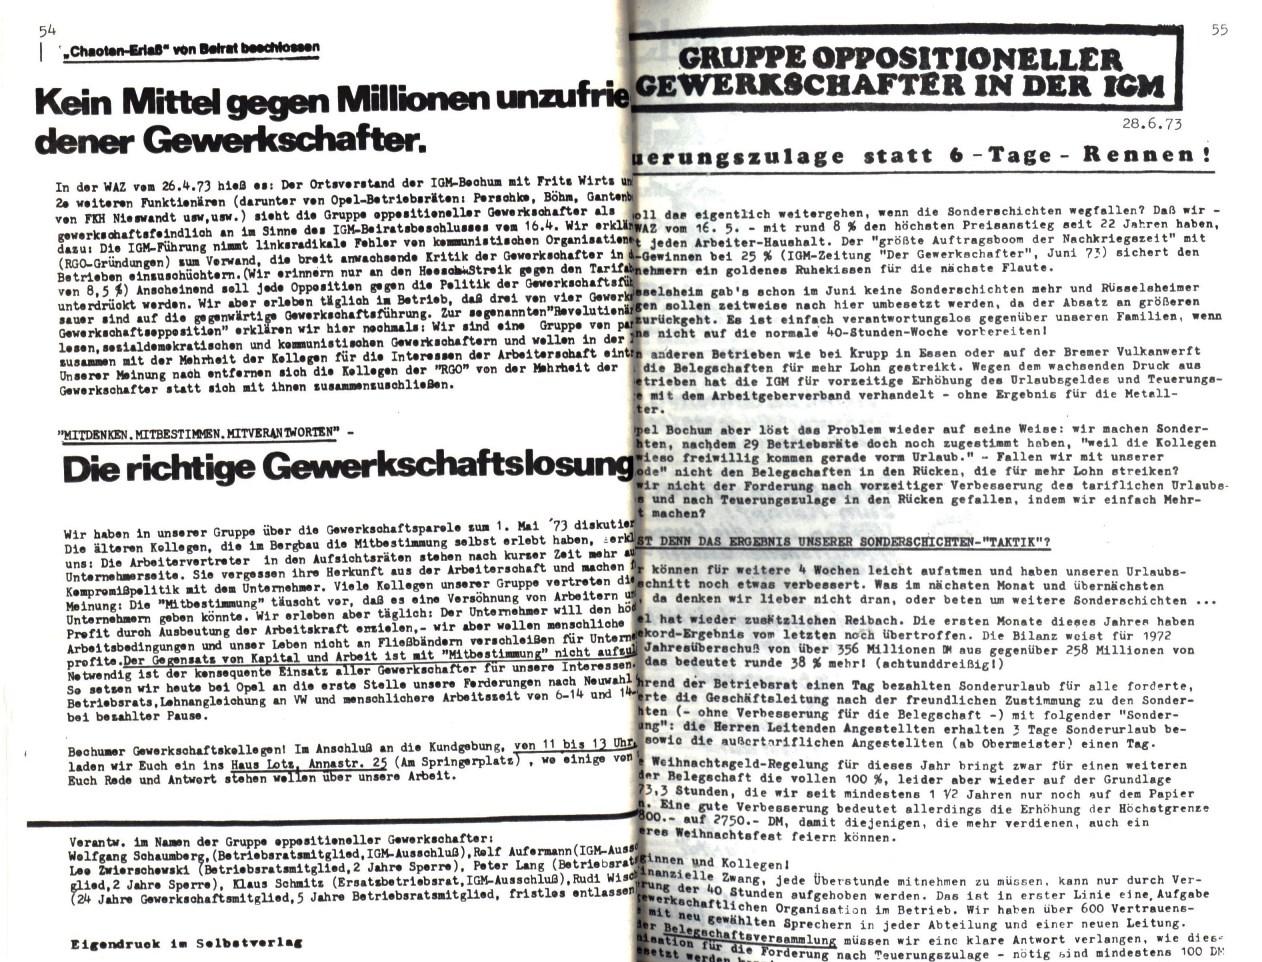 Bochum_IGM_Opel_PG_Opel_streikt_1973_029